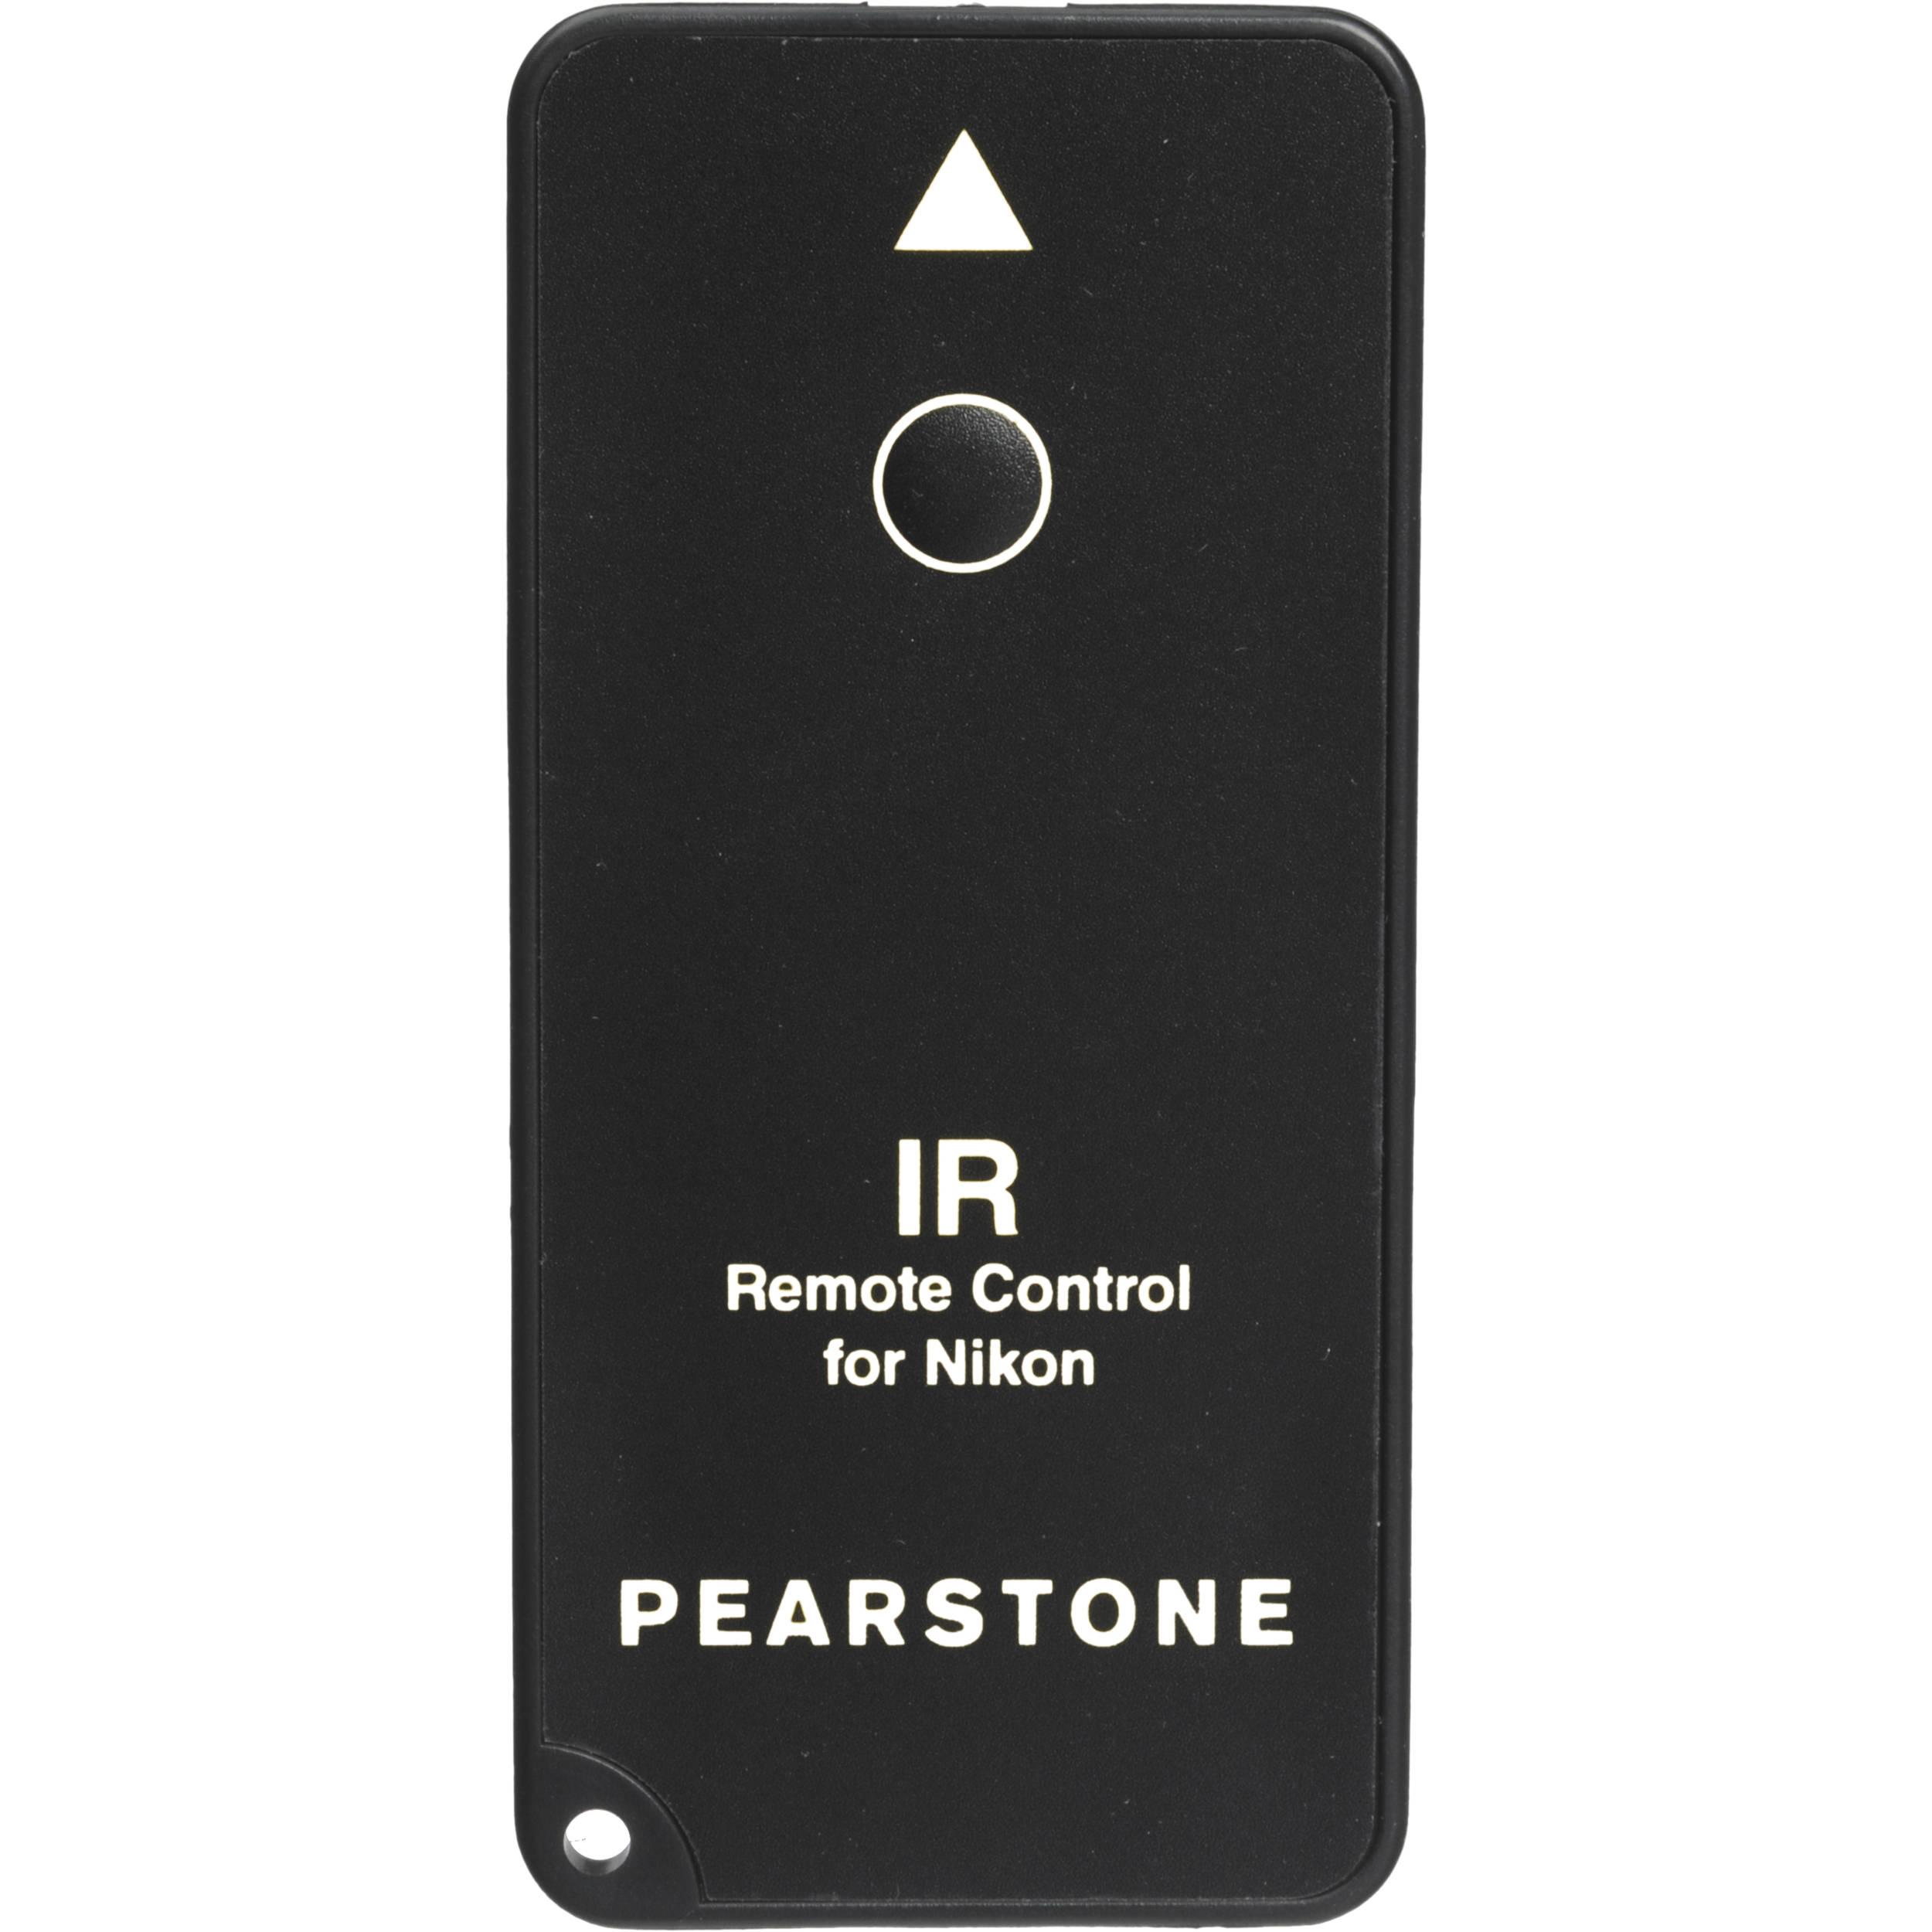 Pearstone IR-N1 Infrared Remote Control for Nikon Digital IR-N1